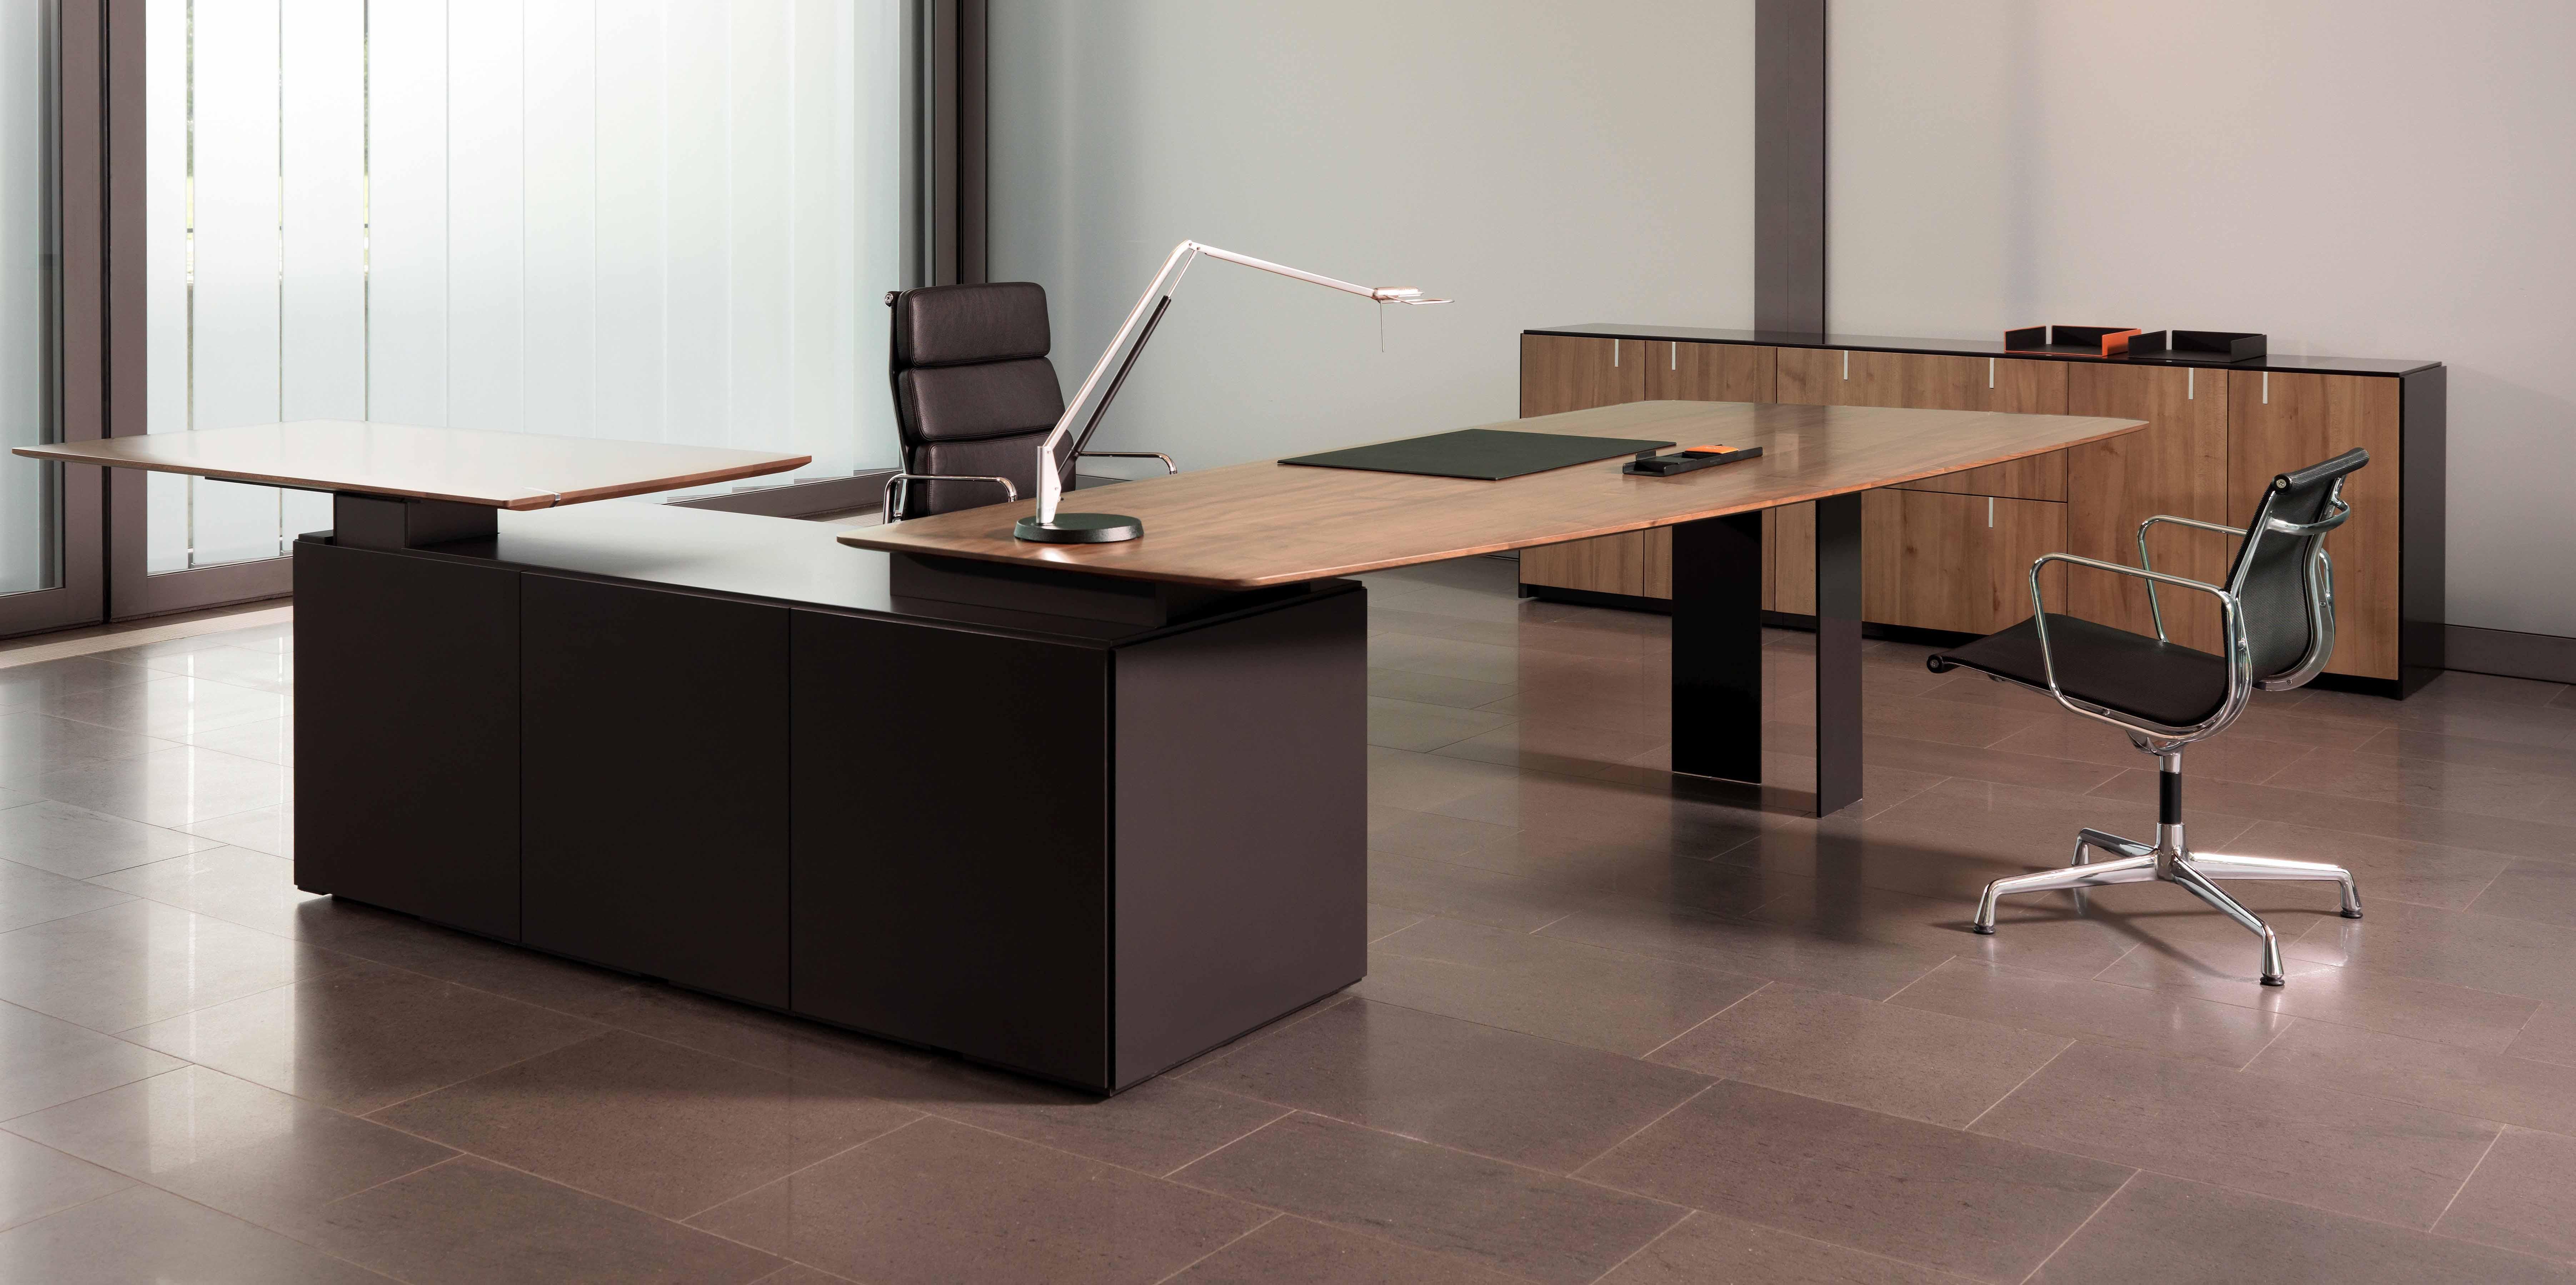 100 mobilier de bureau neuf occasion meuble Mobilier de bureau occasion